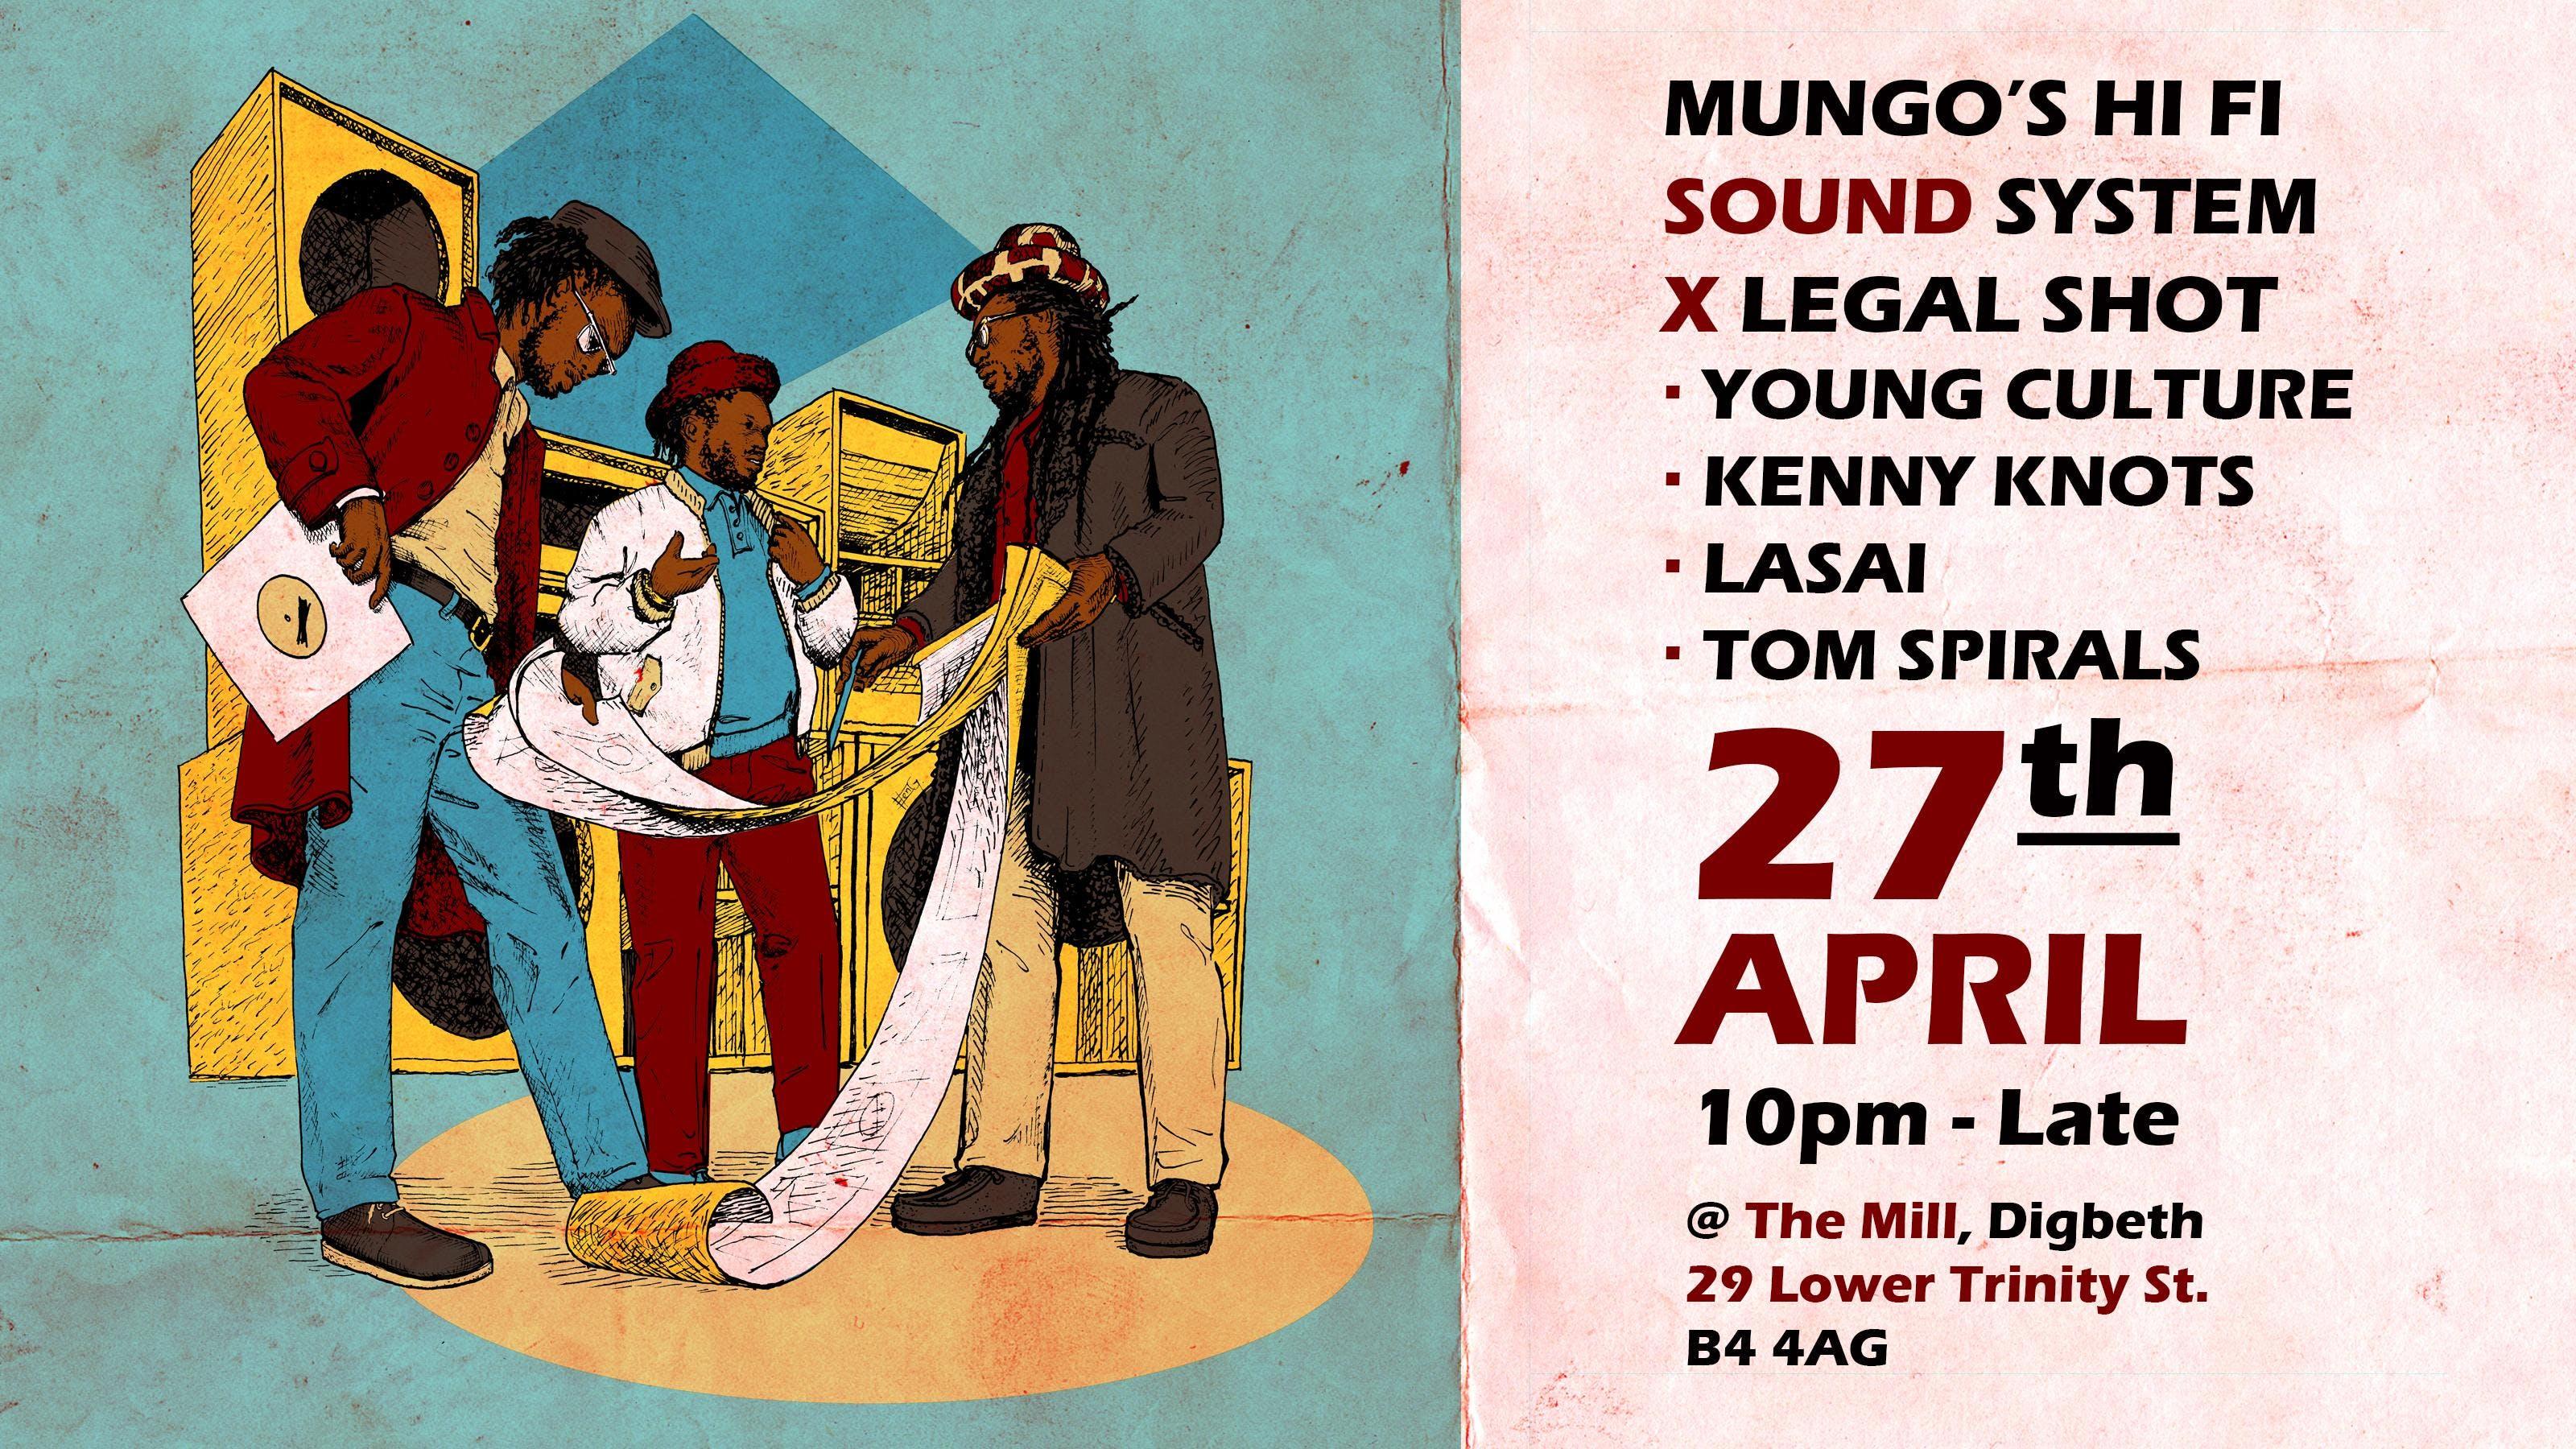 Mungo's Hifi Soundsystem x Legal Shot (The Mi